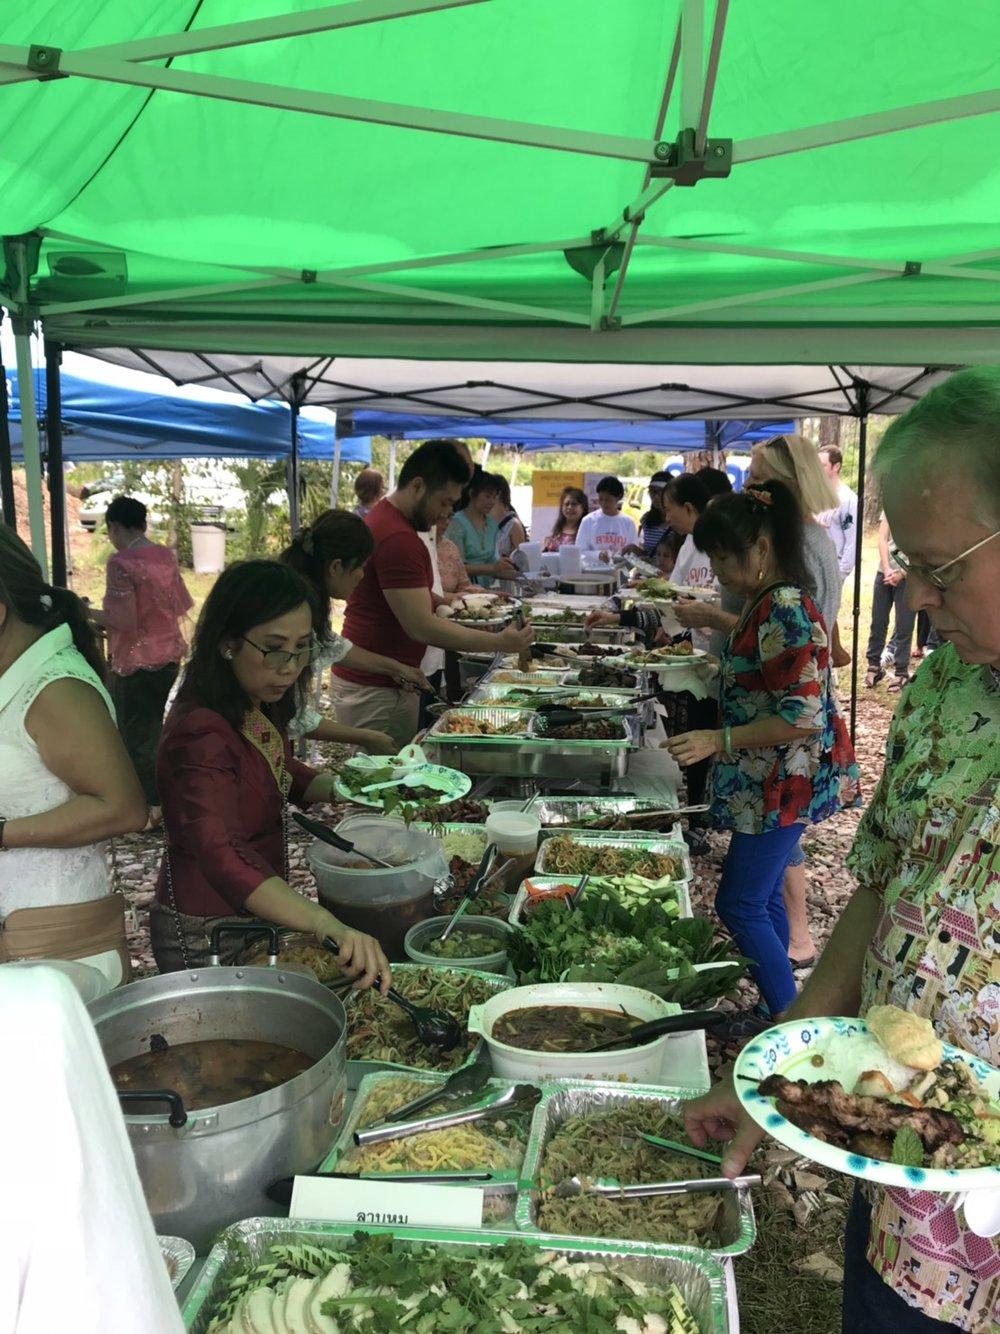 Thailand Restaurant provided food.